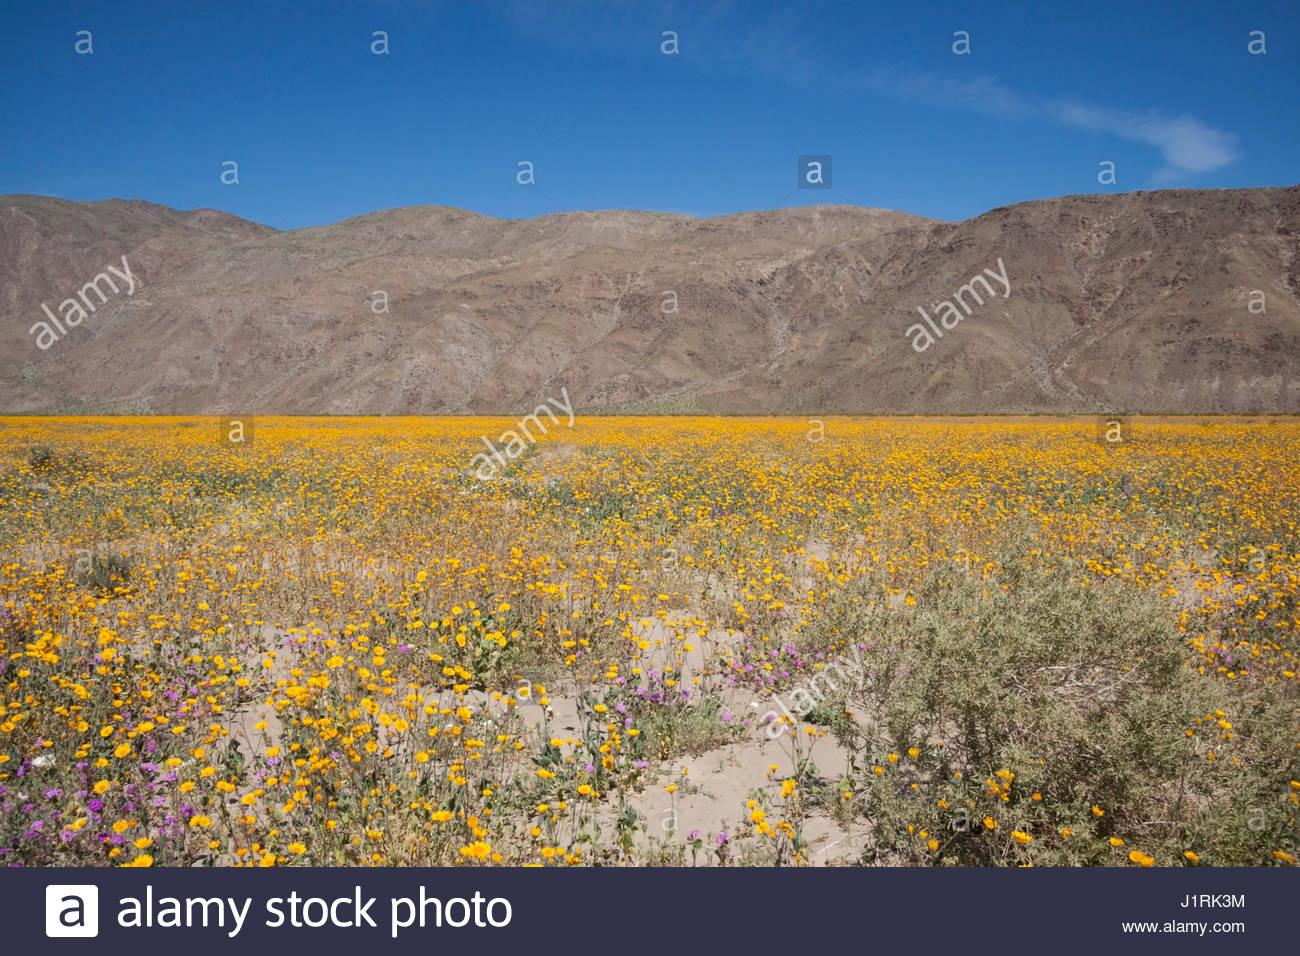 2017 Wildflower Superbloom at Henderson Canyon, Anza Borrego Desert State Park, California - Stock Image